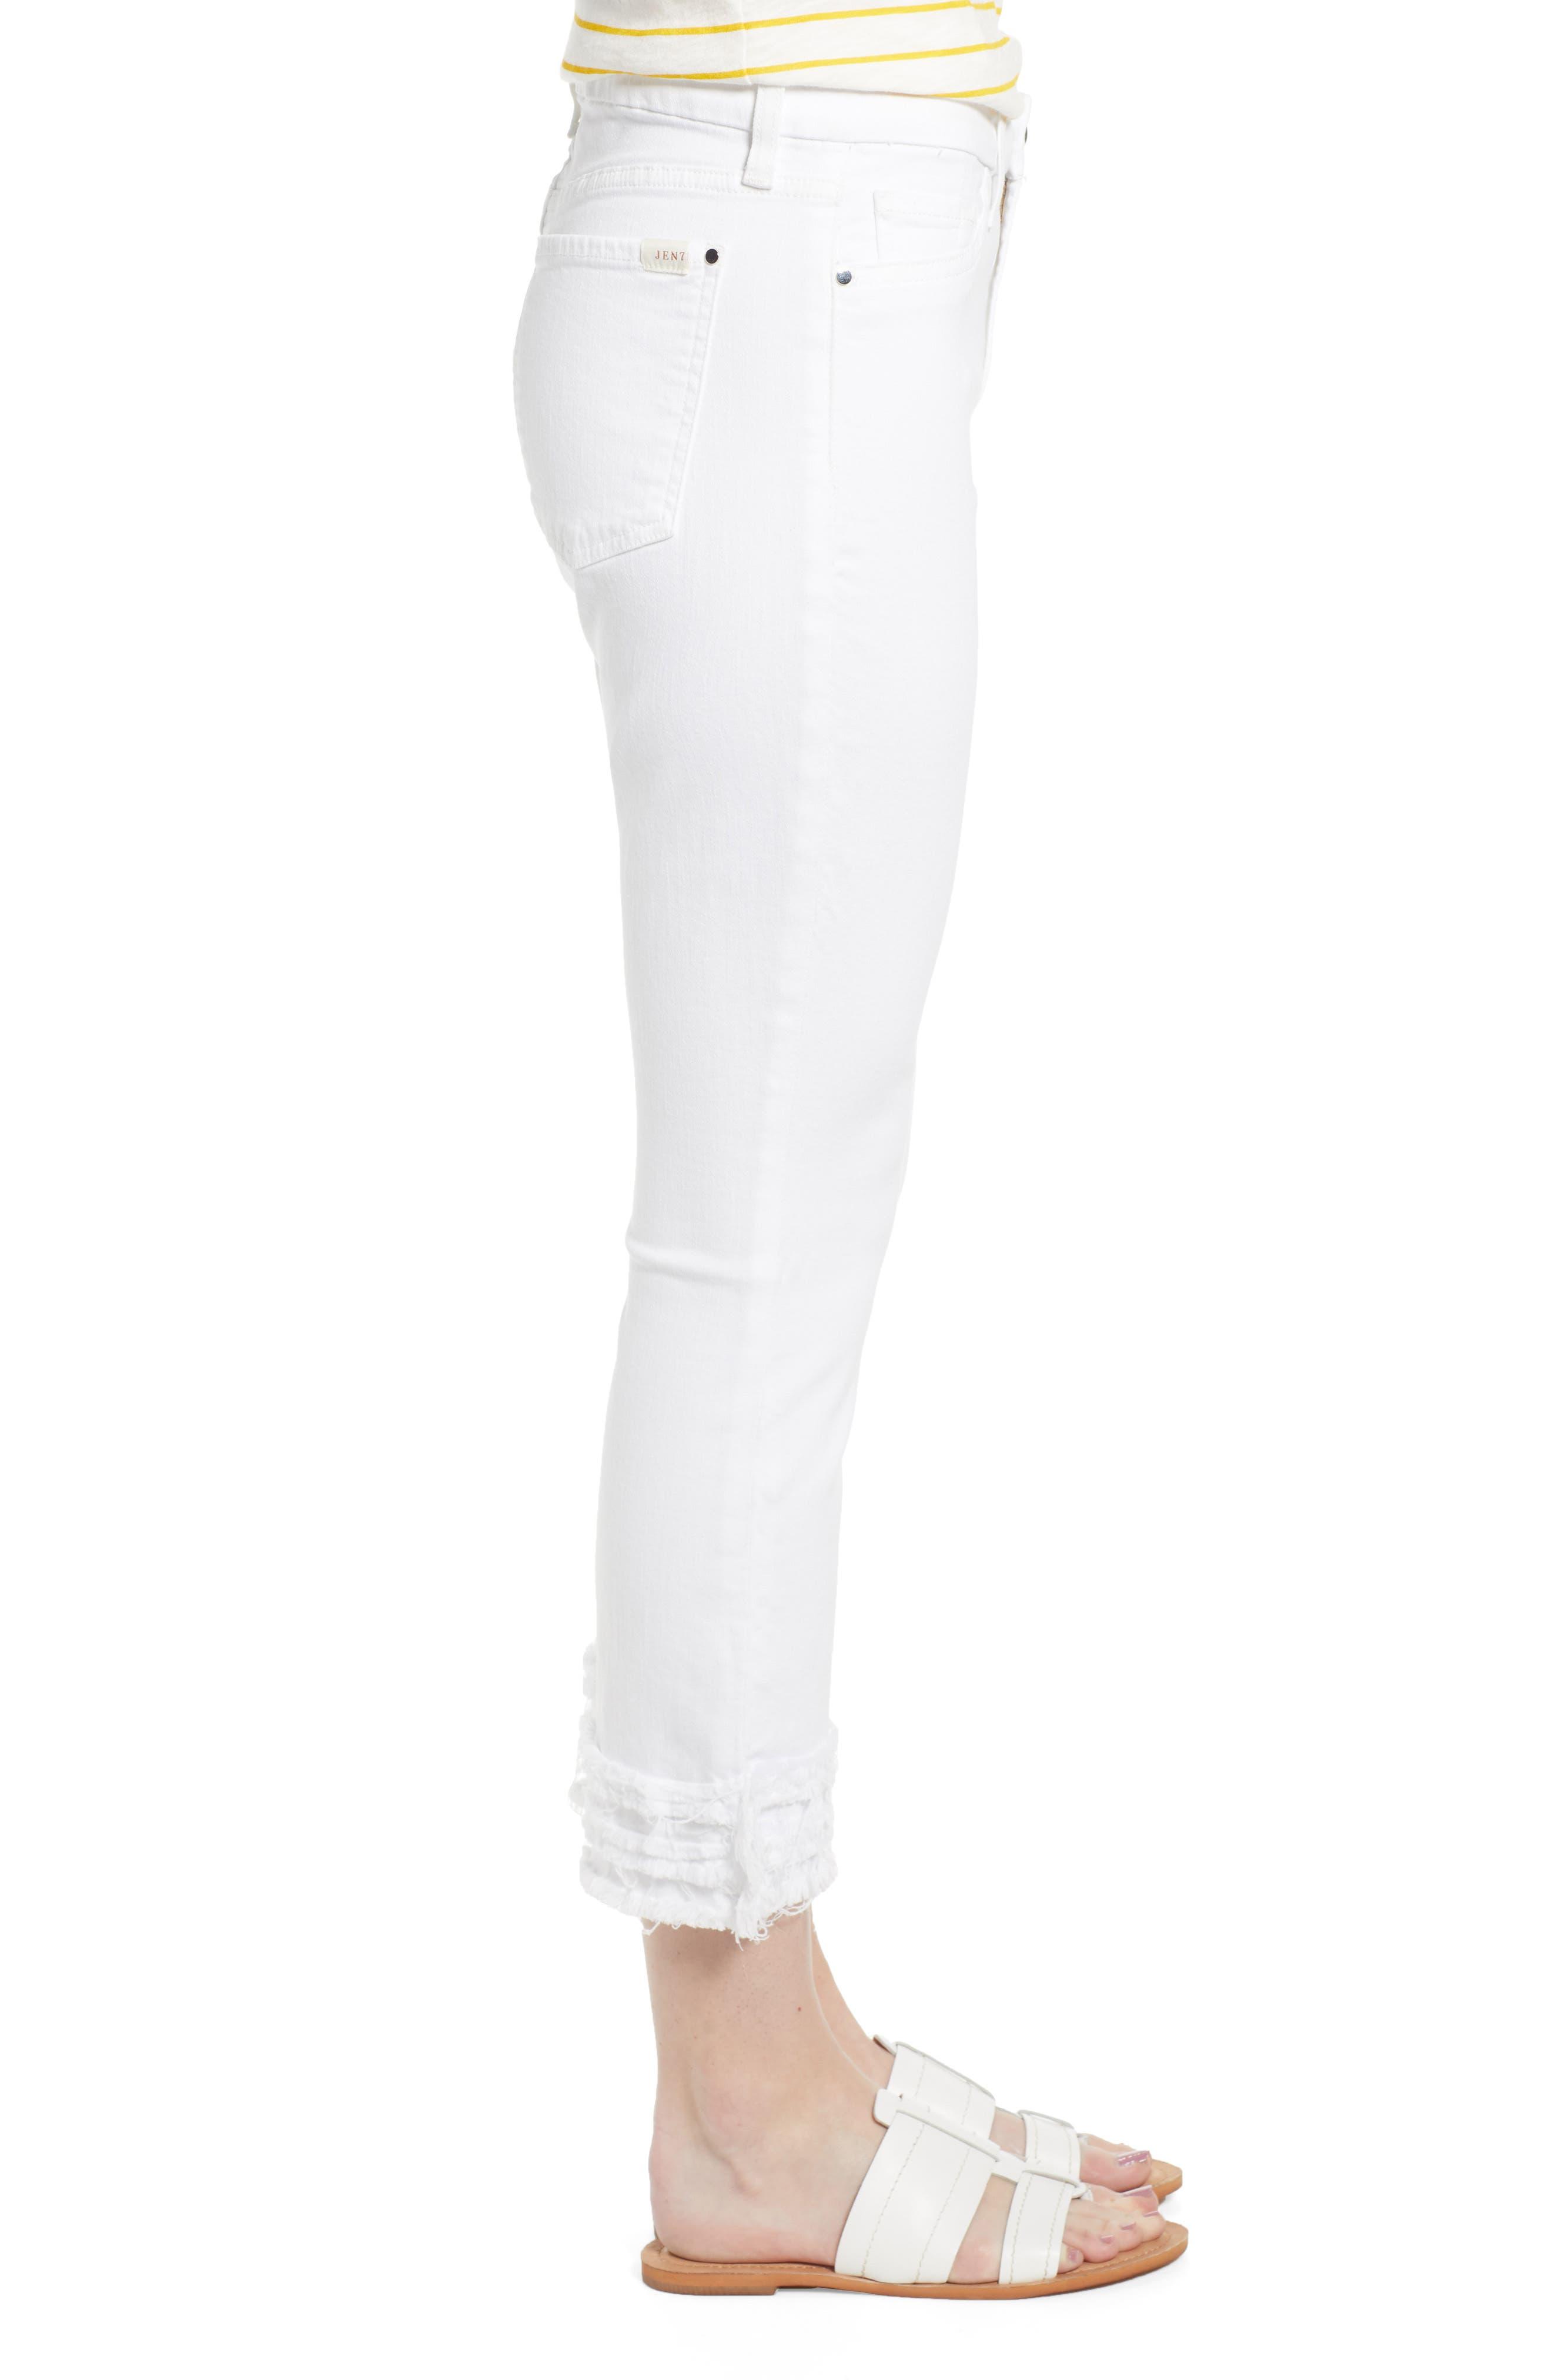 JEN7 BY 7 FOR ALL MANKIND, Fringe Hem Crop Jeans, Alternate thumbnail 4, color, WHITE FASHION